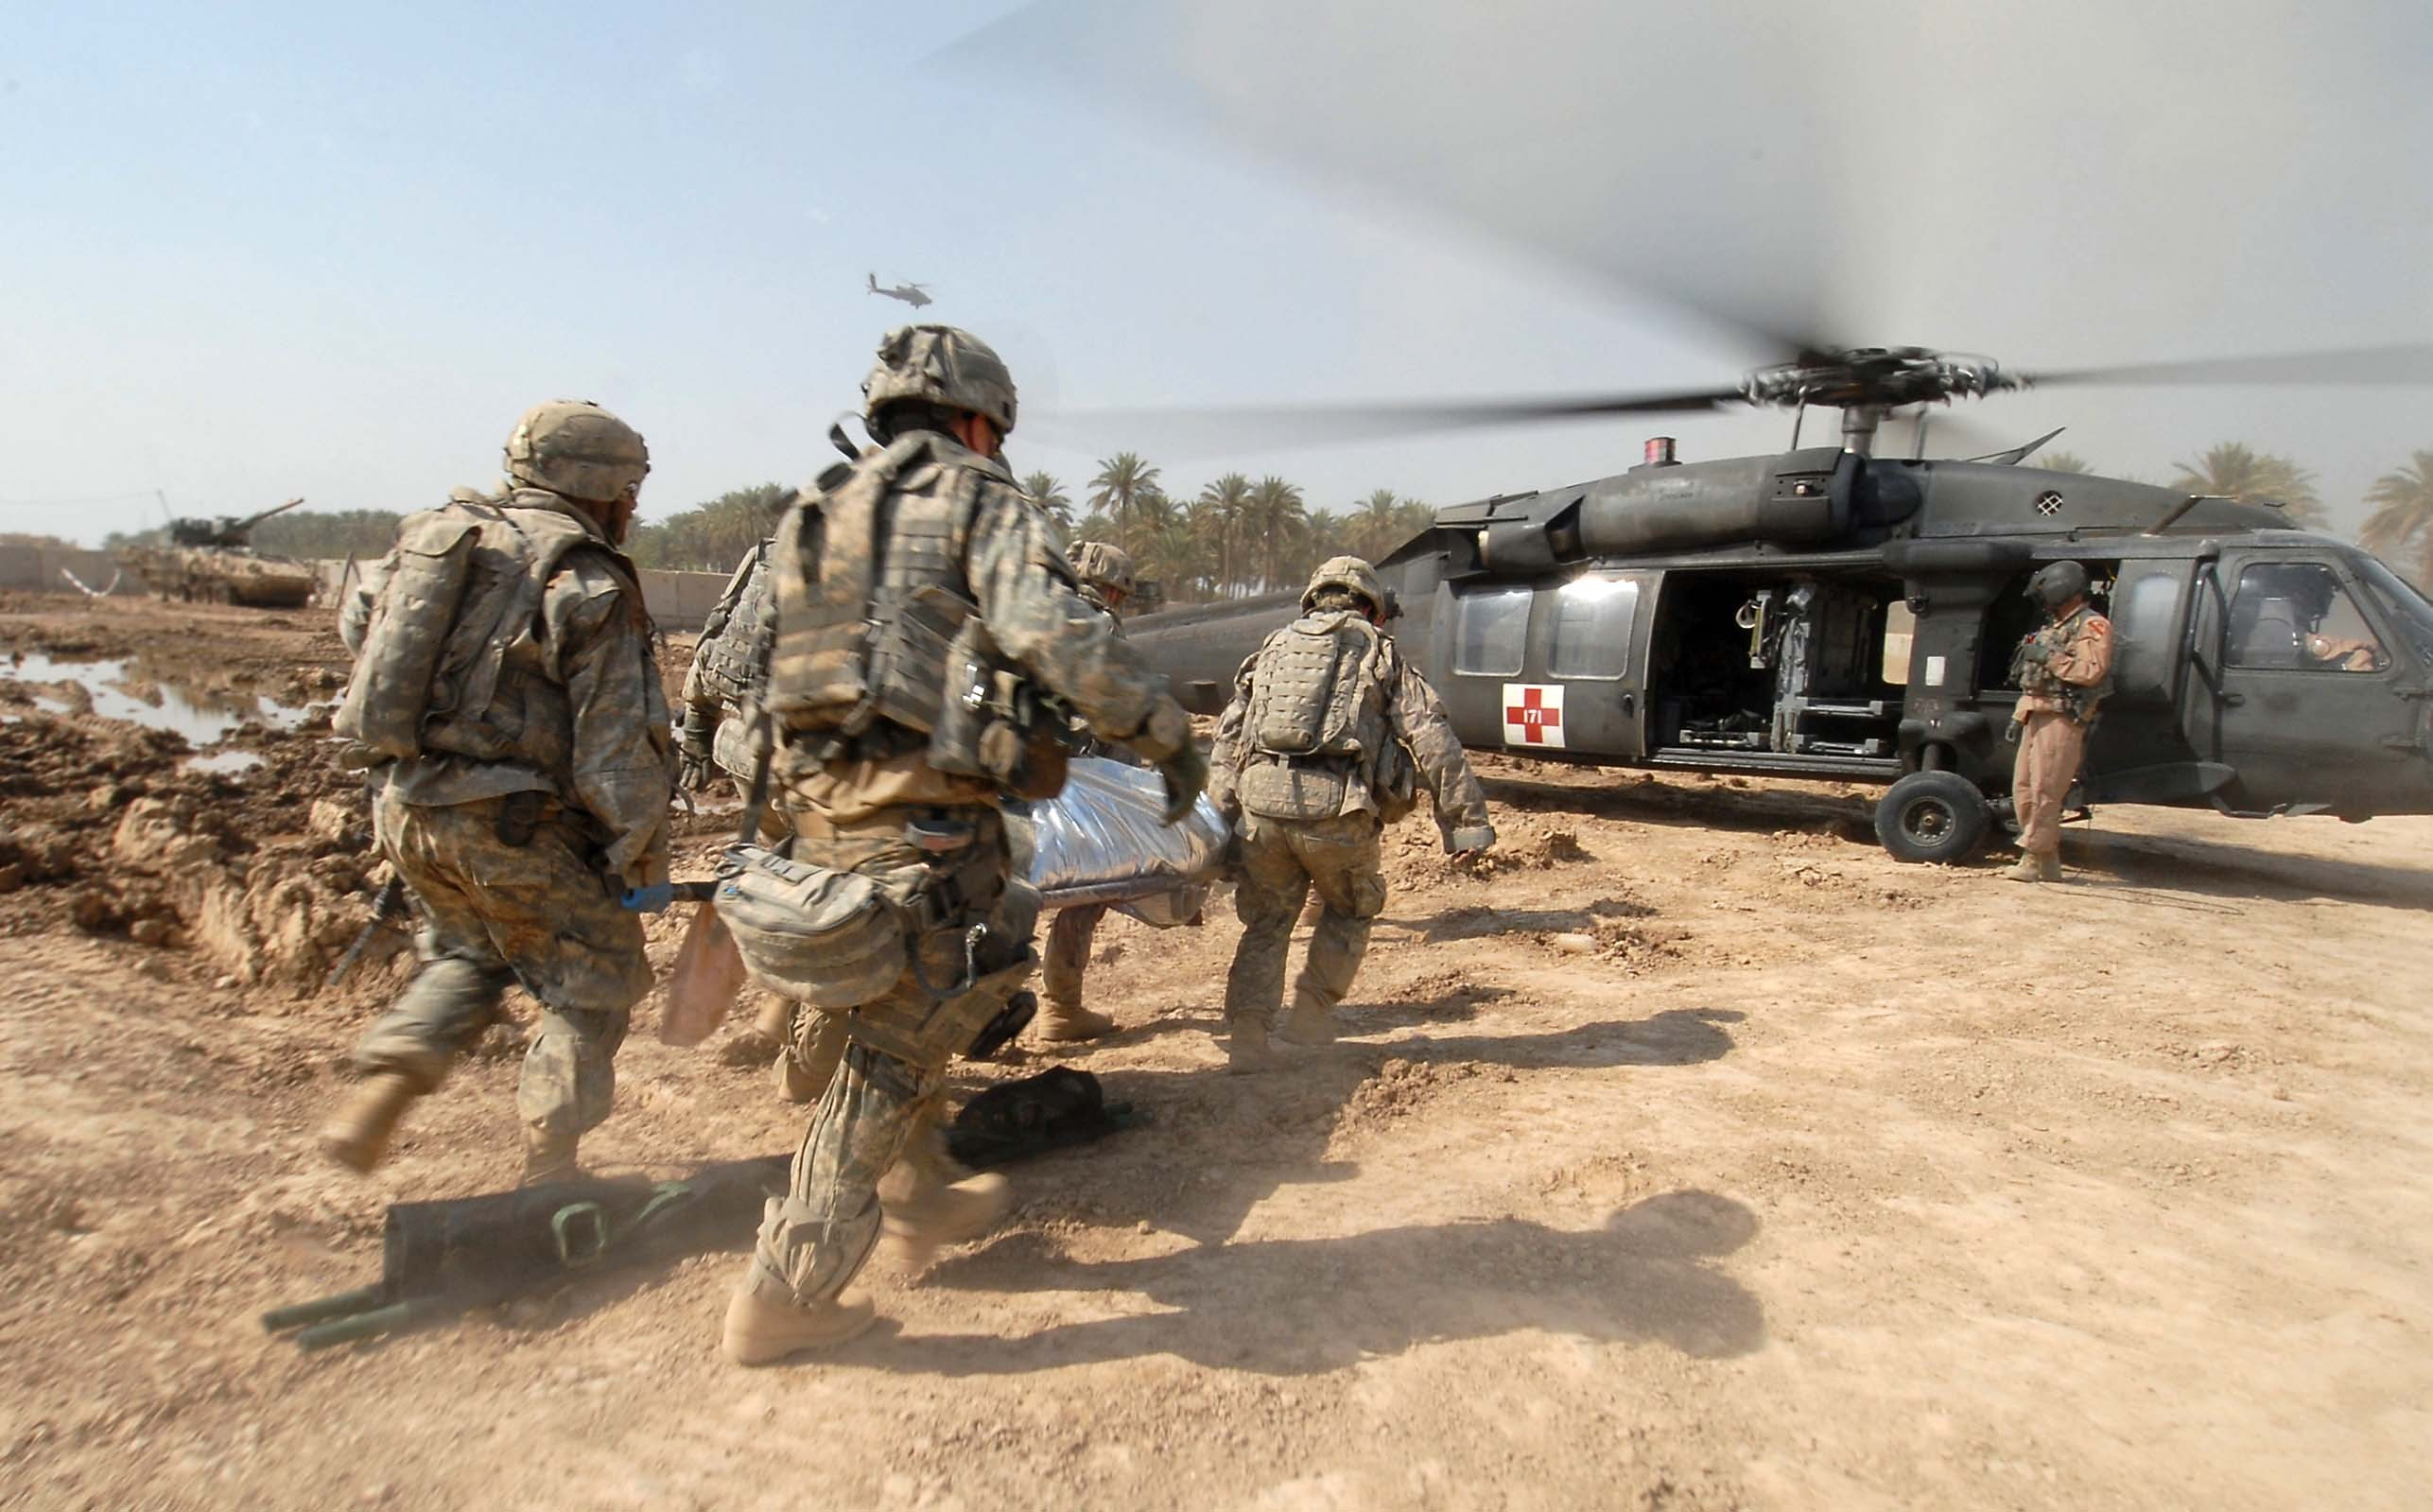 www.army.mil/e2/c/images/2012/01/20/232645/original.jpg